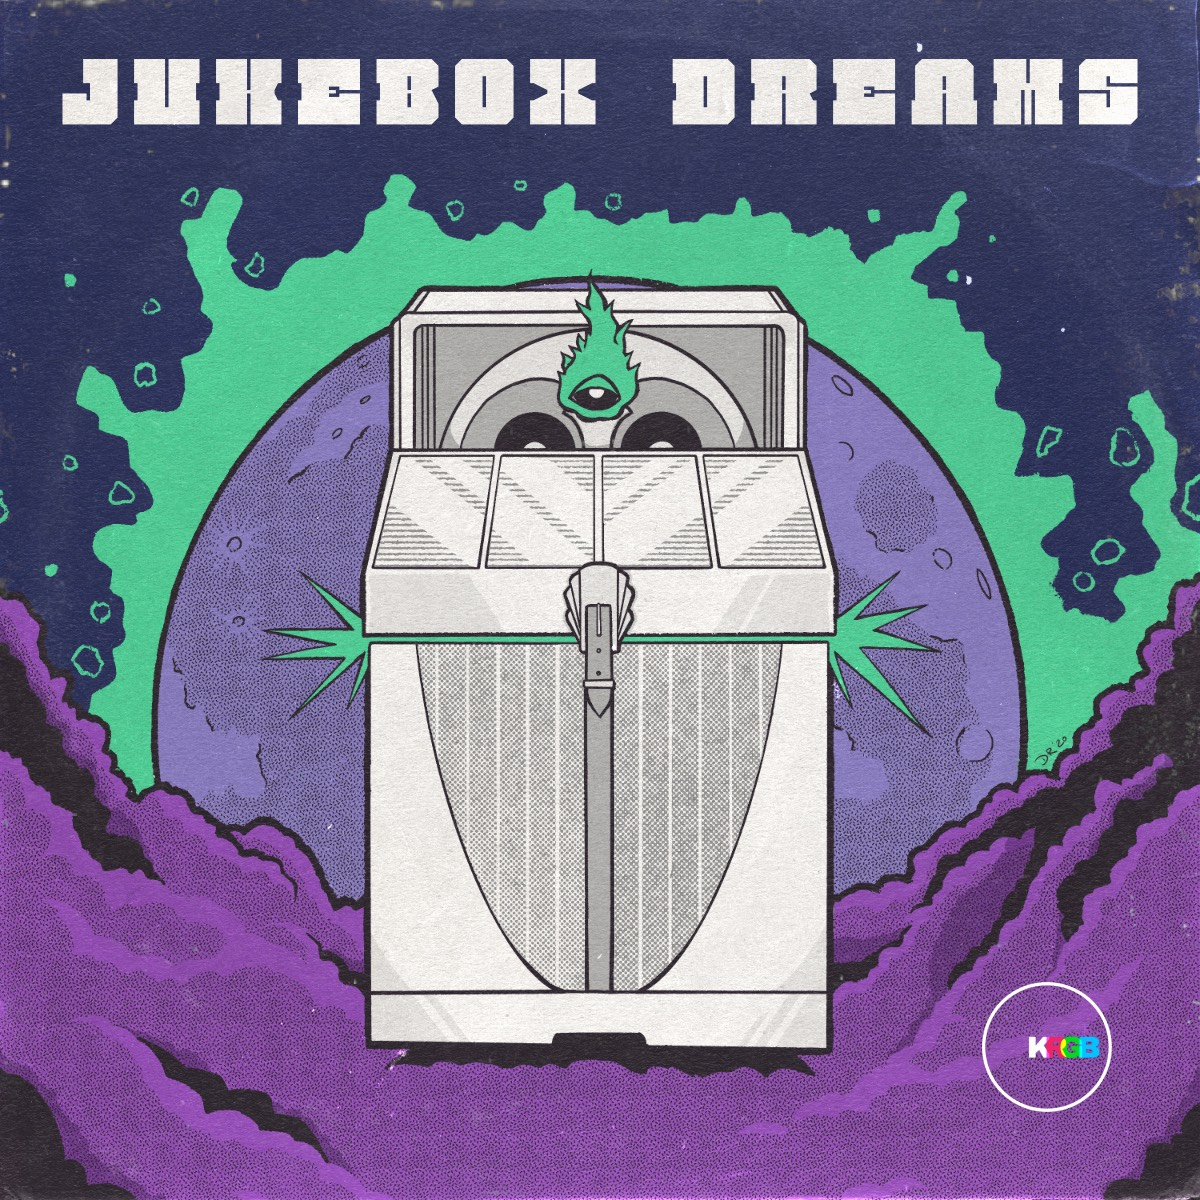 Show art for Jukebox Dreams